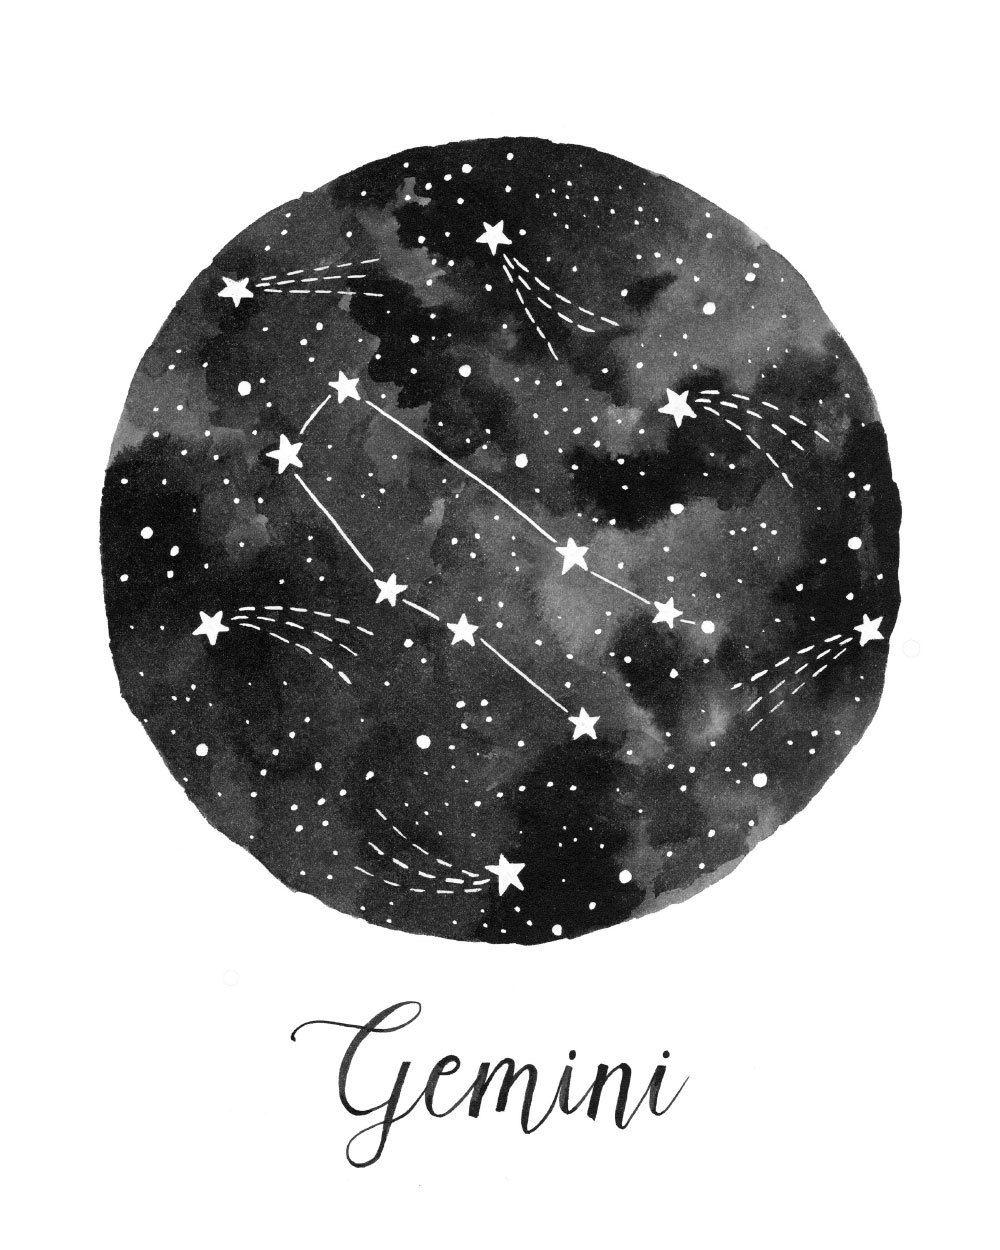 Gemini Constellation Illustration Vertical by fercute on Etsy